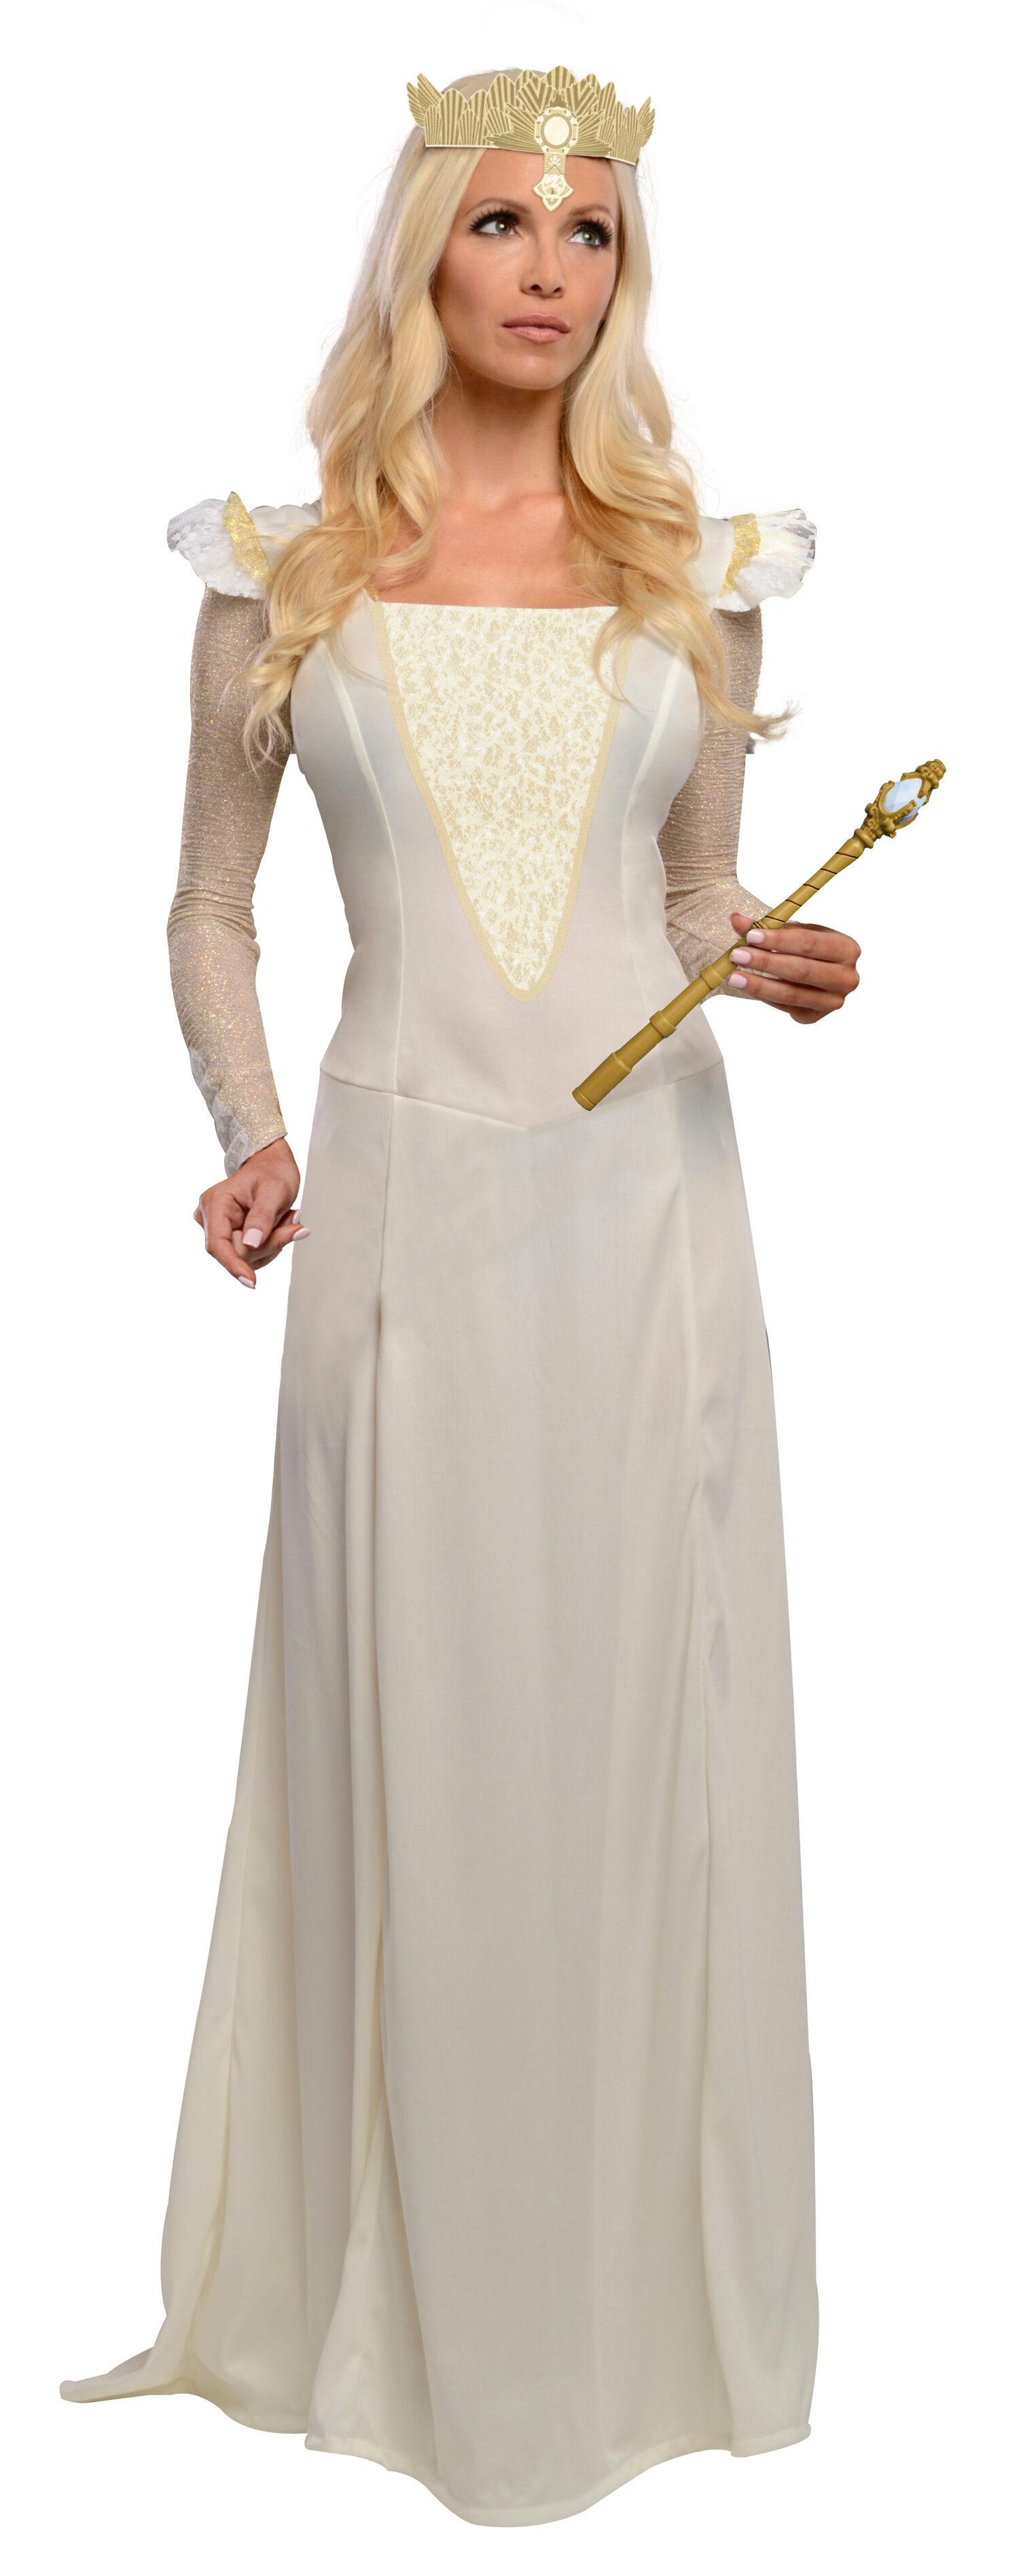 Sexy glinda the good witch costume